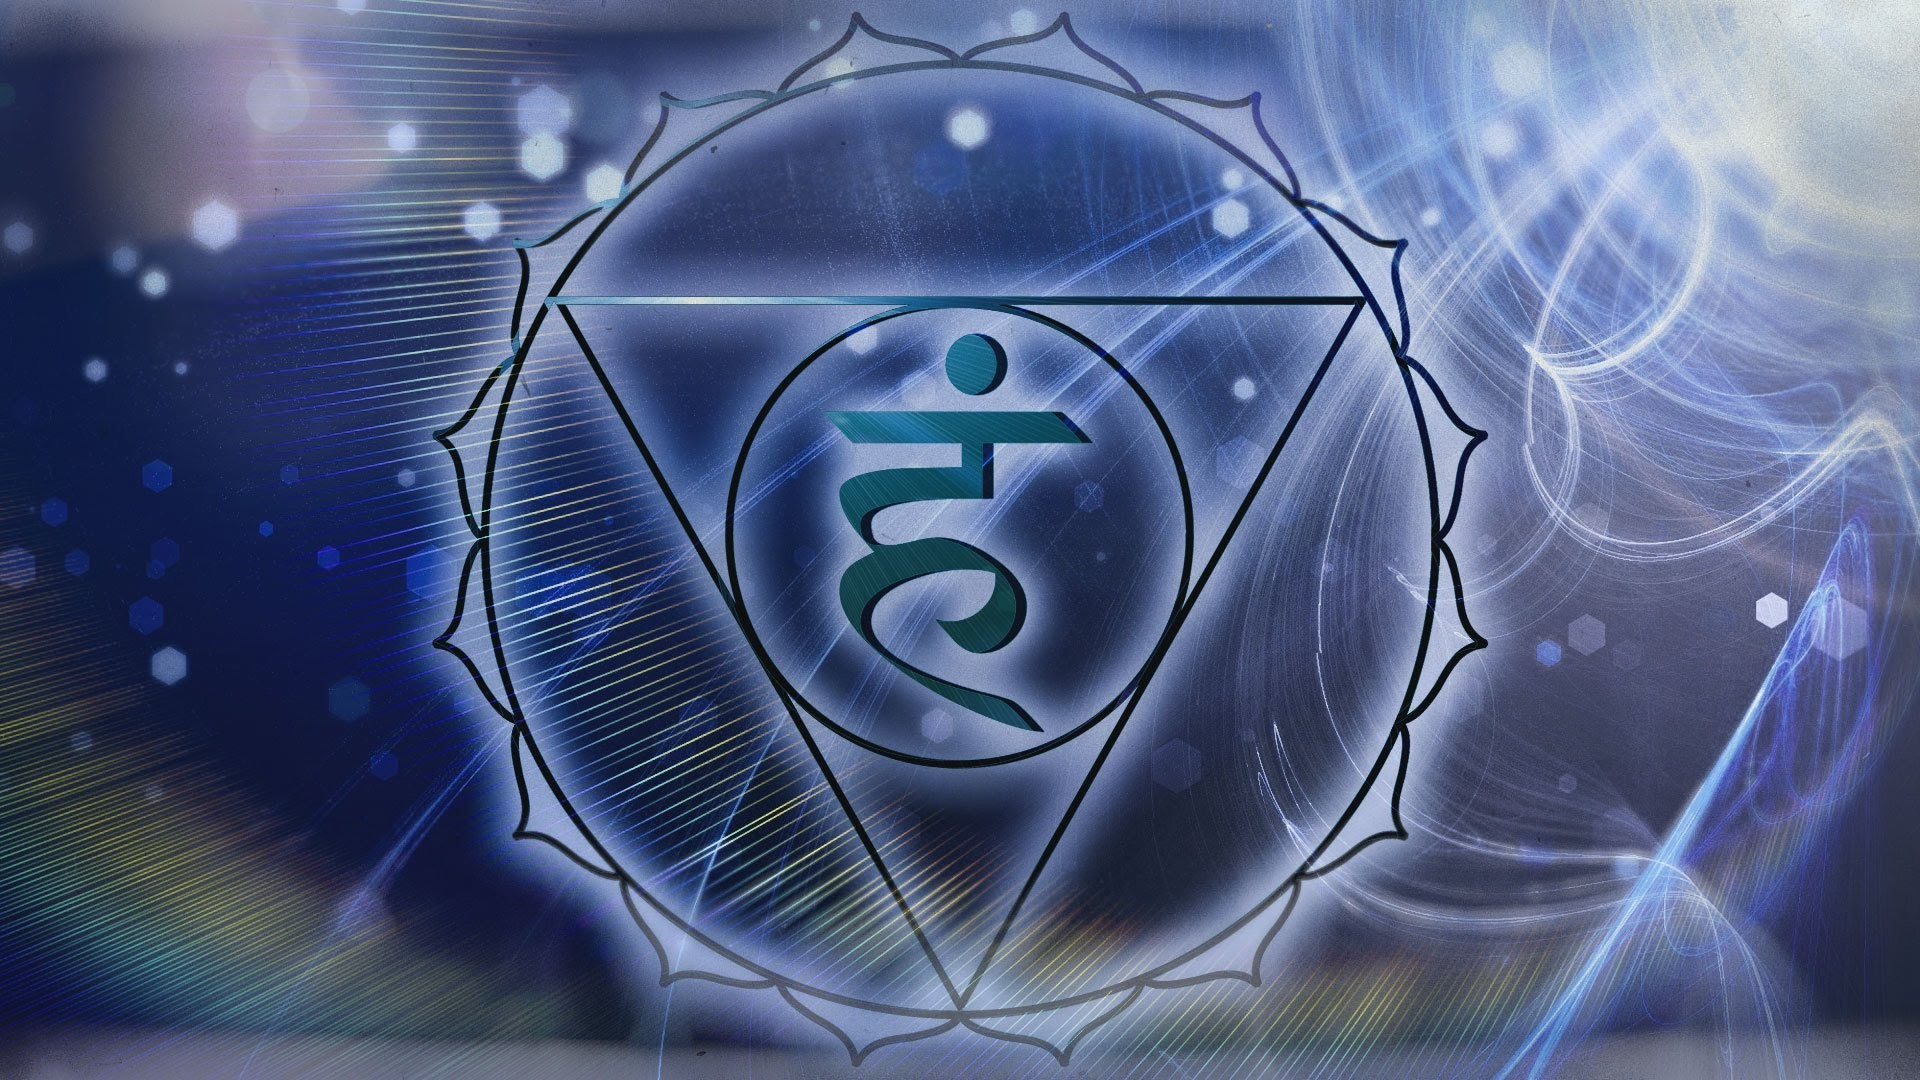 Music For Headphones VI – G – Throat Chakra, Scorpio, Deep Sleep Meditate 1  Hour HD